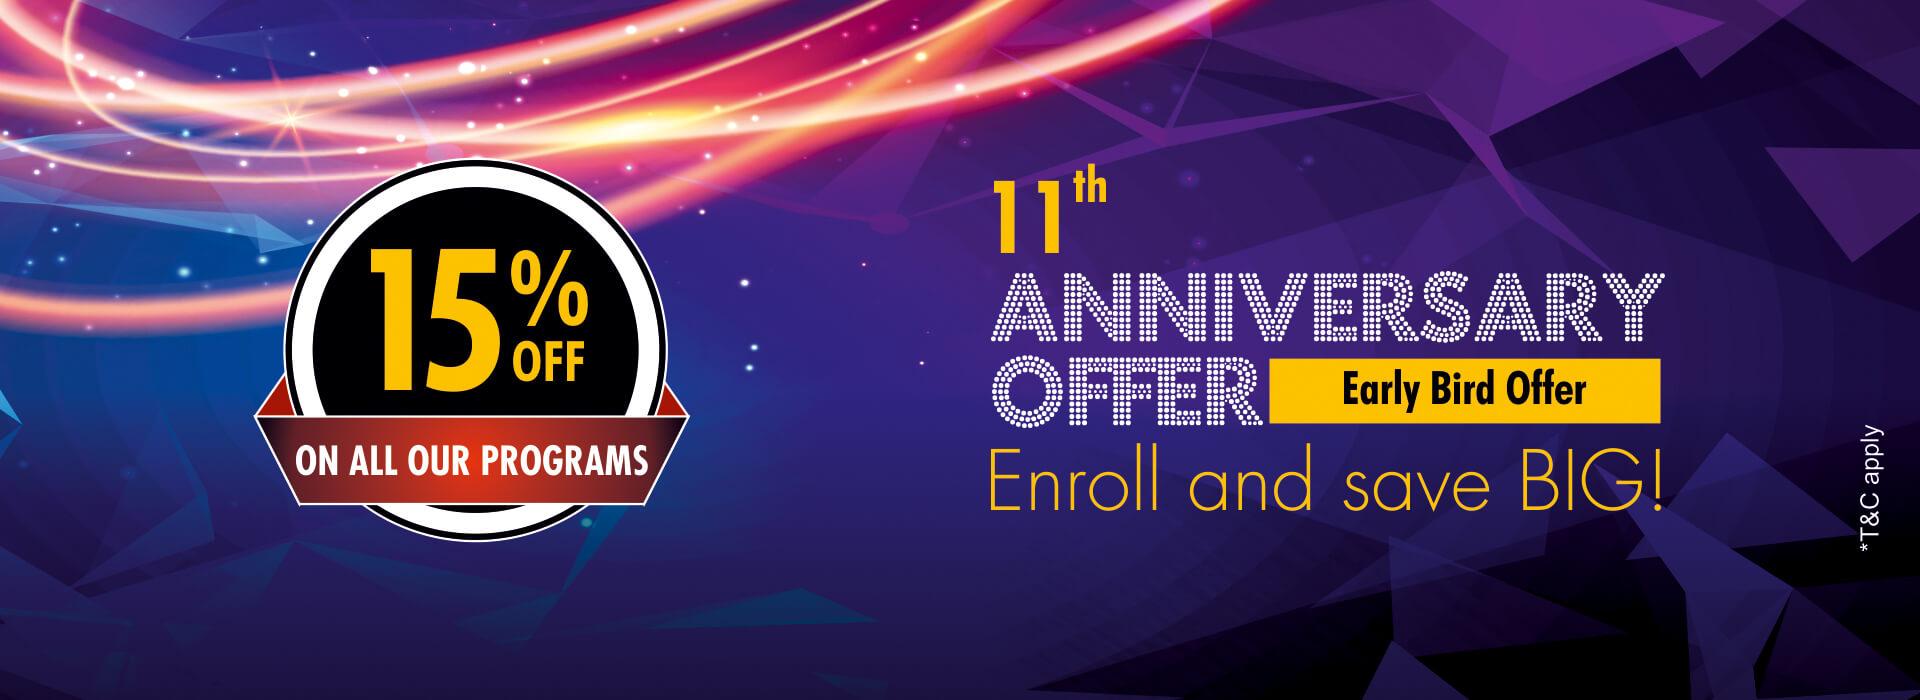 Patsav - Eleventh Anniversary - Best Videography Training in Hyderabad | Delhi